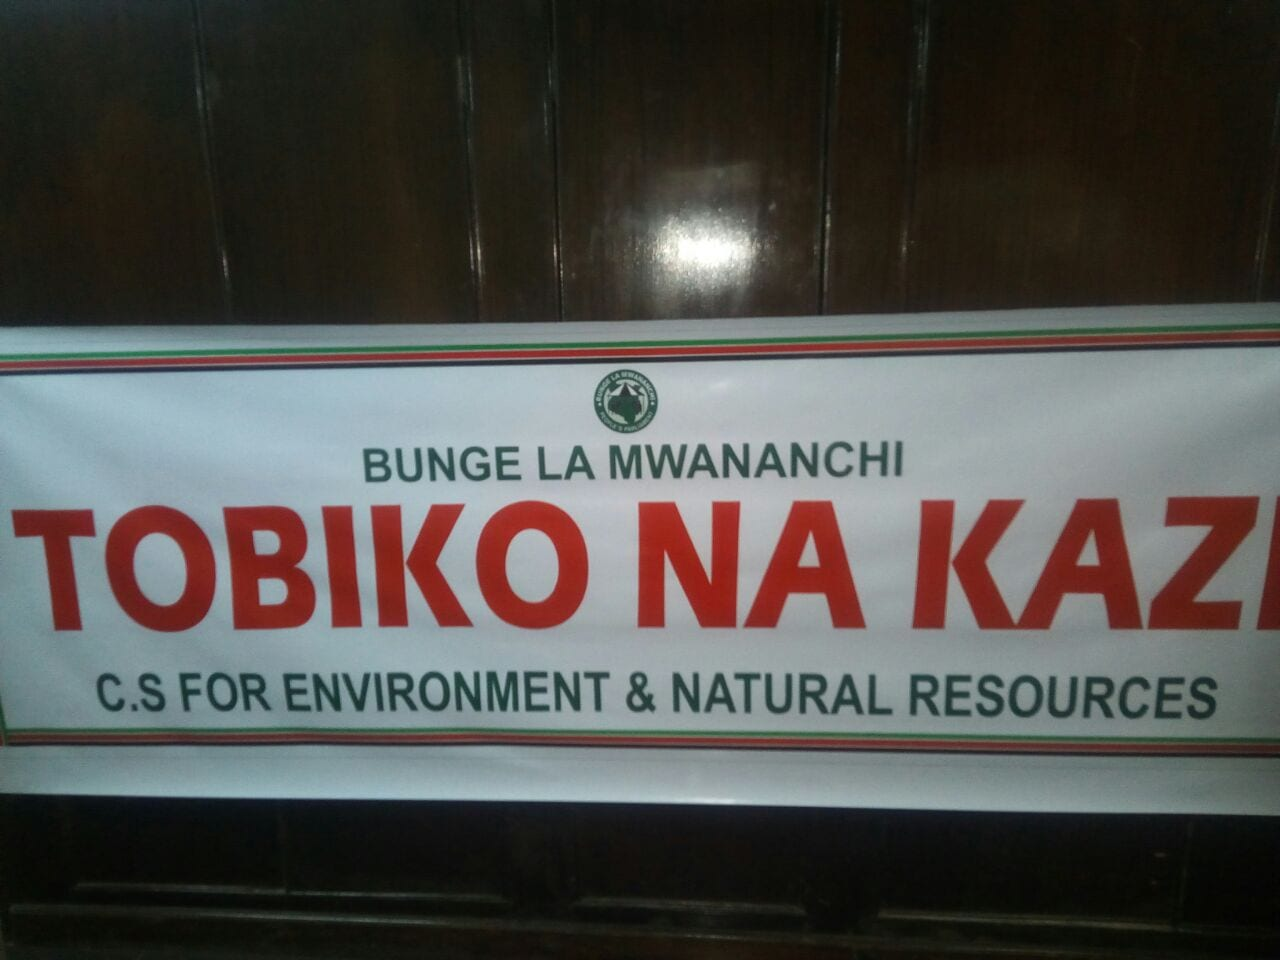 Cabinet Vetting: Keriako Tobiko endorsed by Bunge La Mwananchi